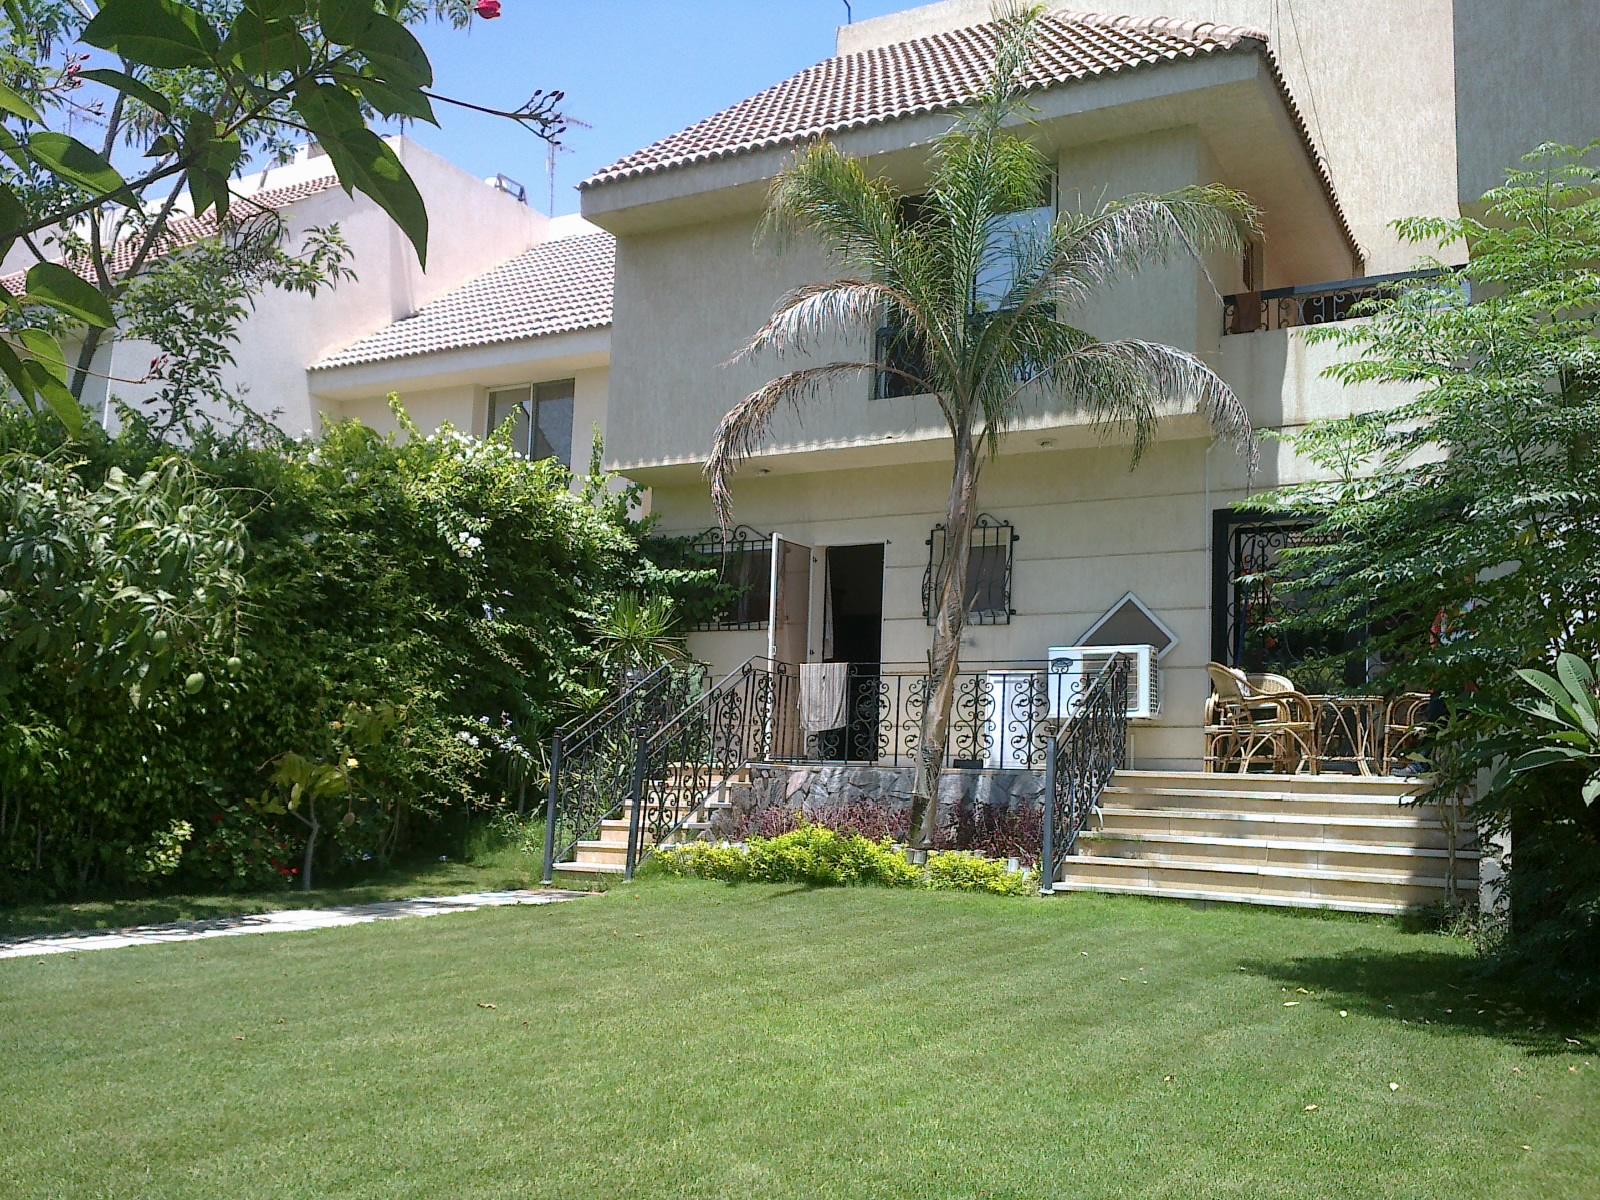 Townhouse Villa For Rent Furnished Inside Compound Mena